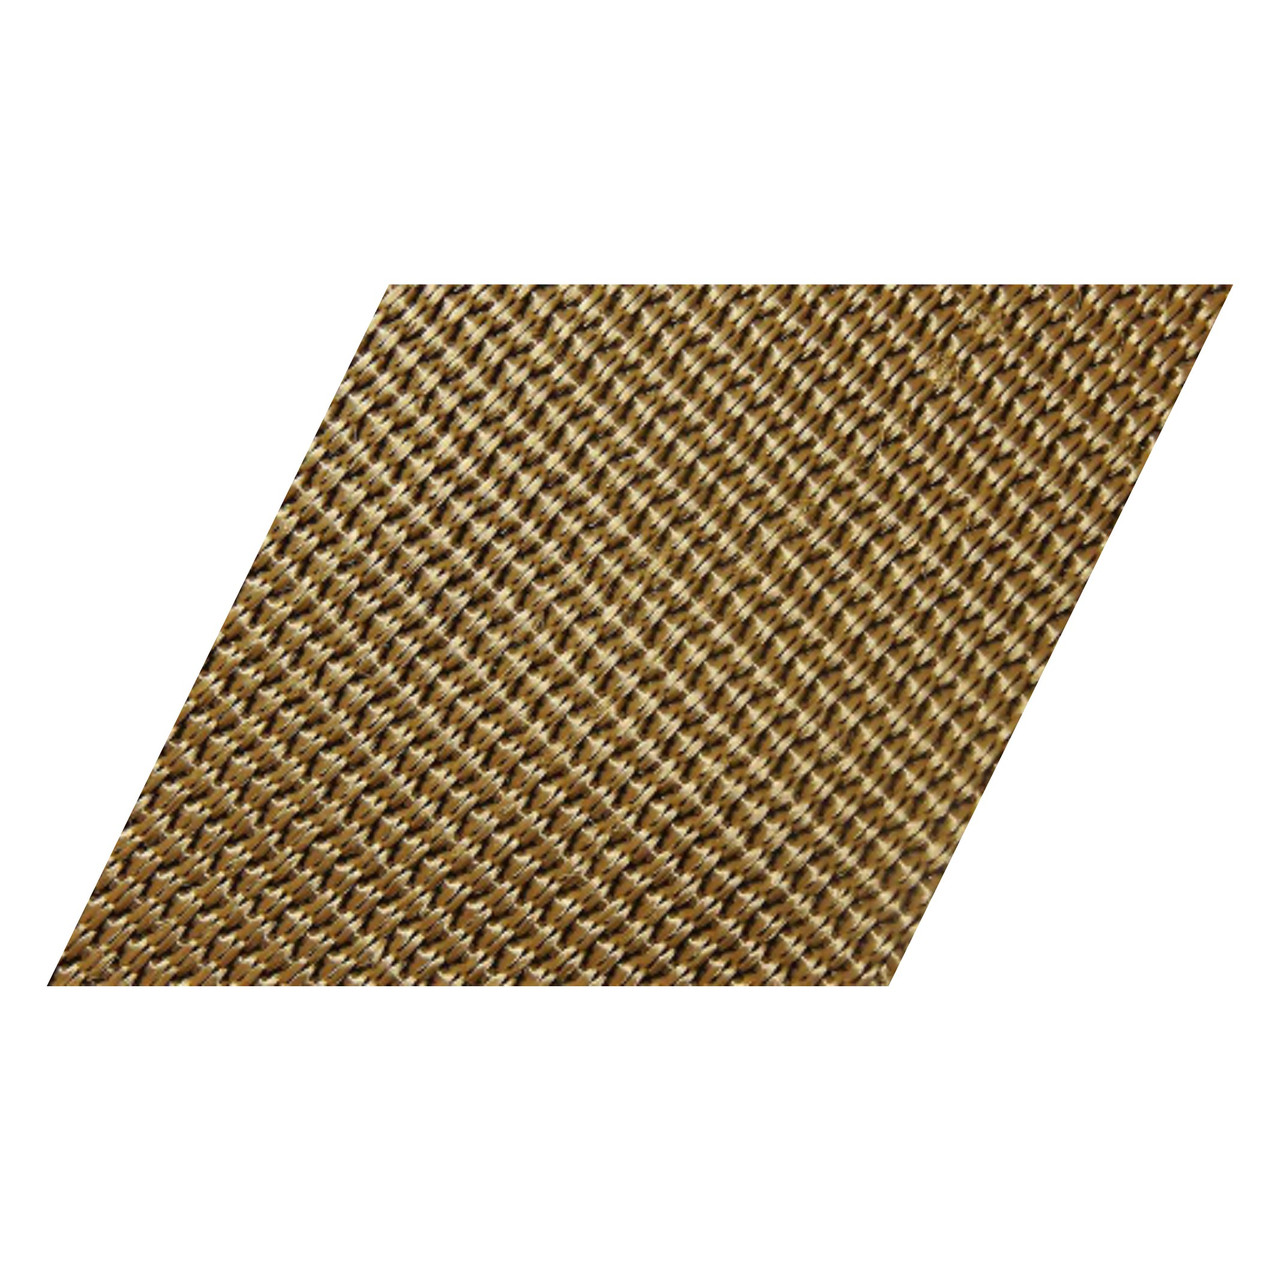 Лента ременная 100% Полиамид 50мм цв кайот (боб 50м) р 3054 Укр-з